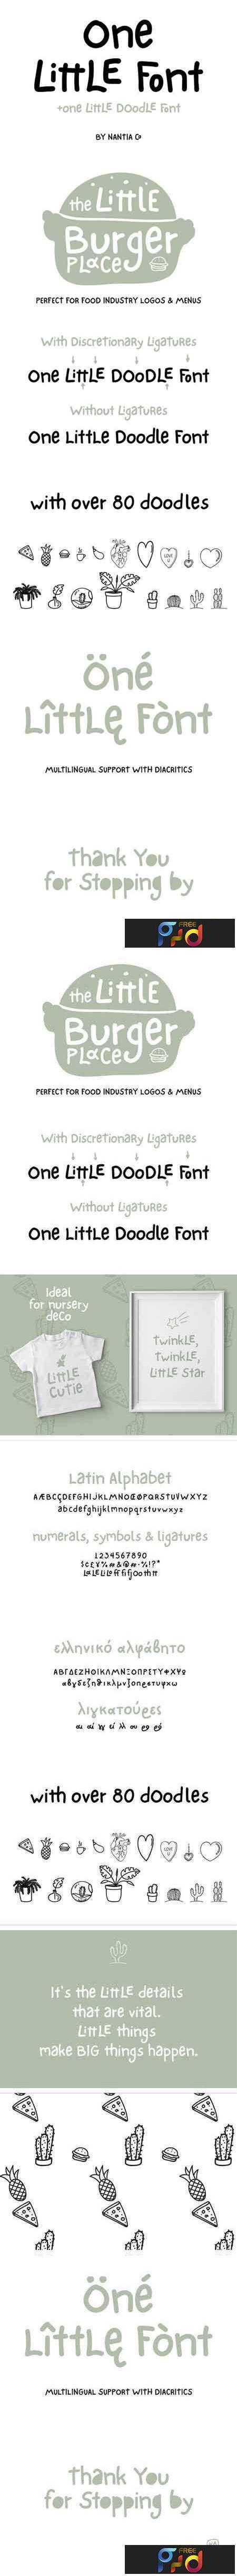 1804138 One Little Font 1505137 1